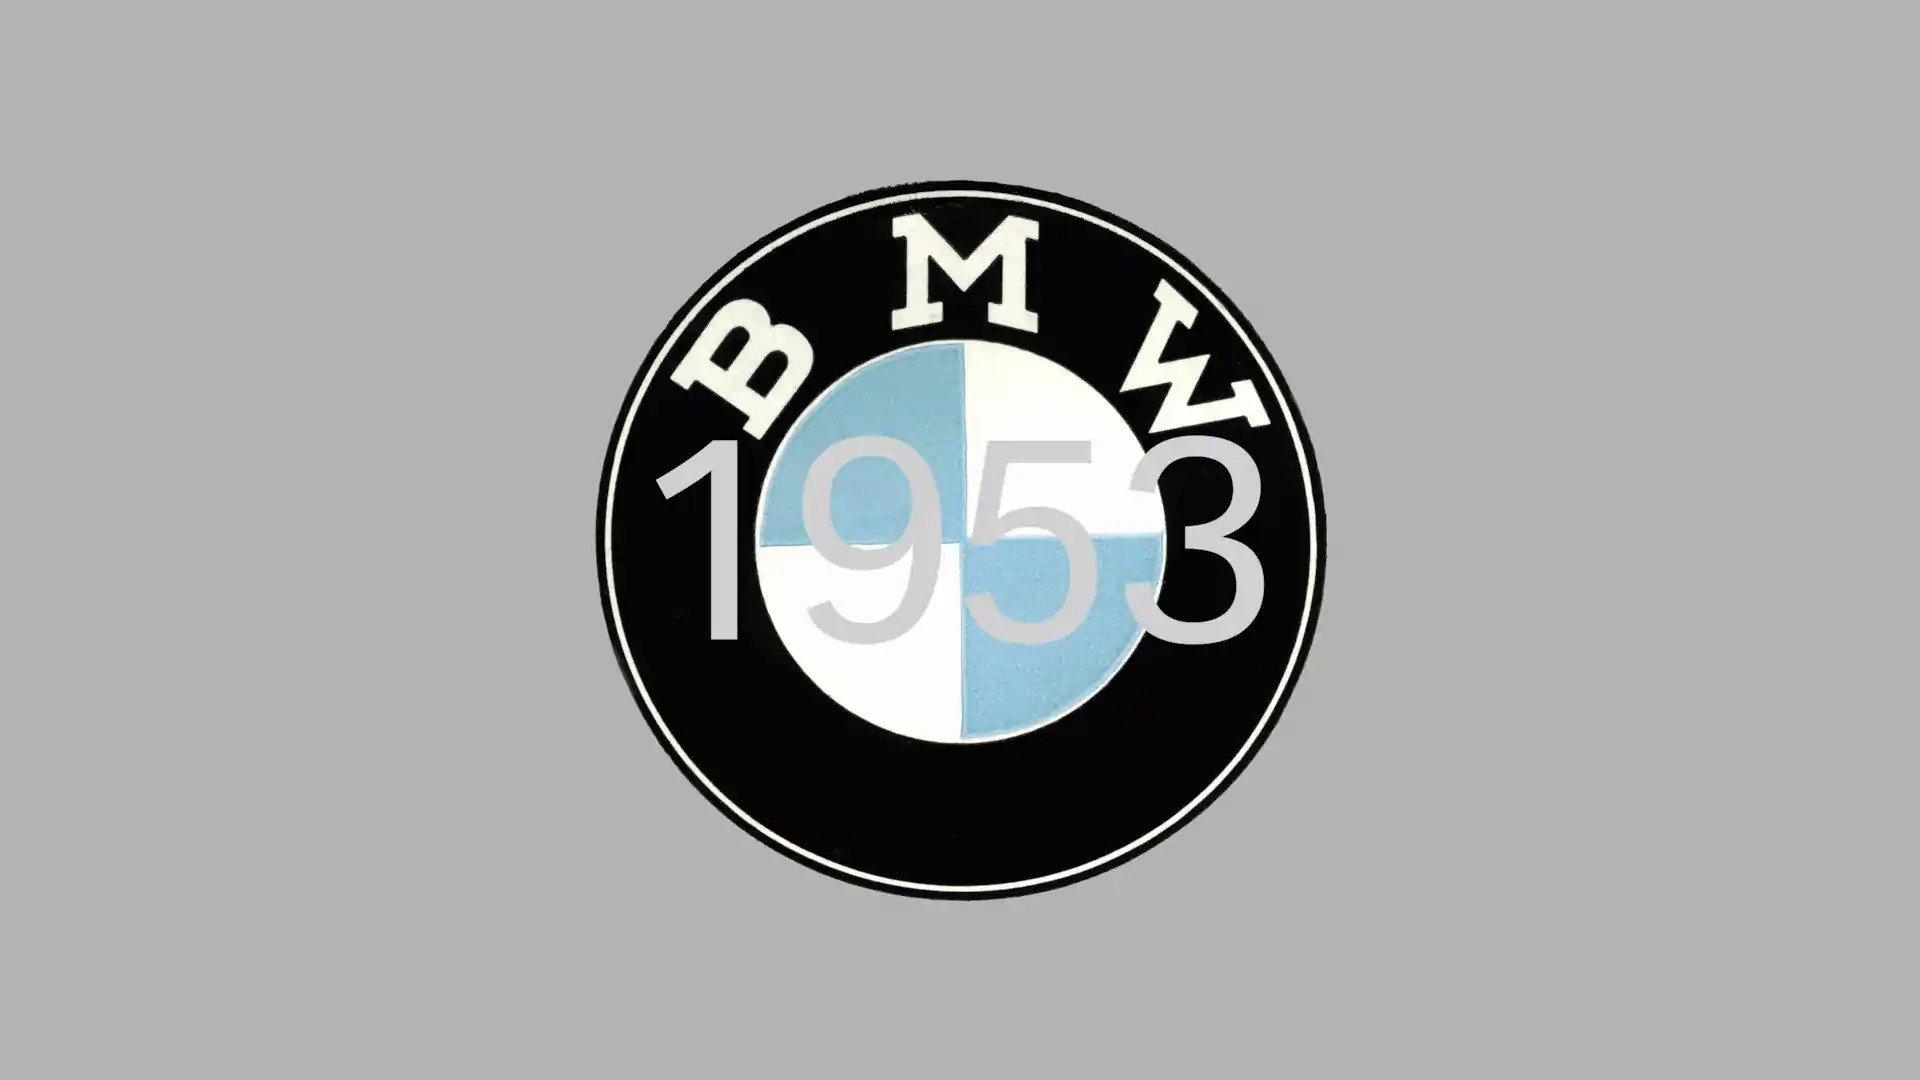 BMW 1953 design